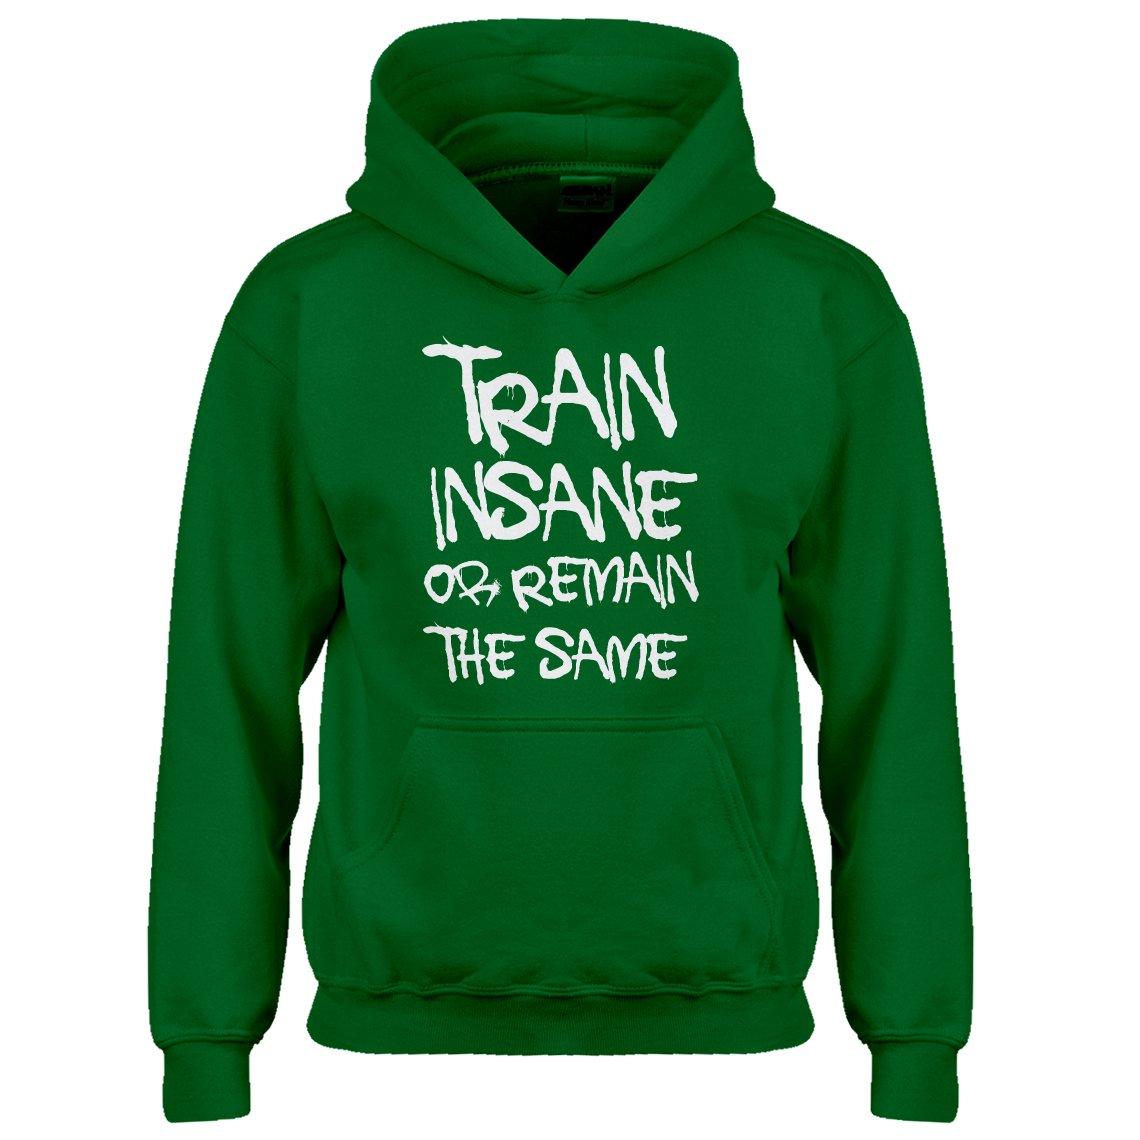 Indica Plateau Kids Hoodie Train Insane Or Remain The Same X-Large Kelly Green Hoodie